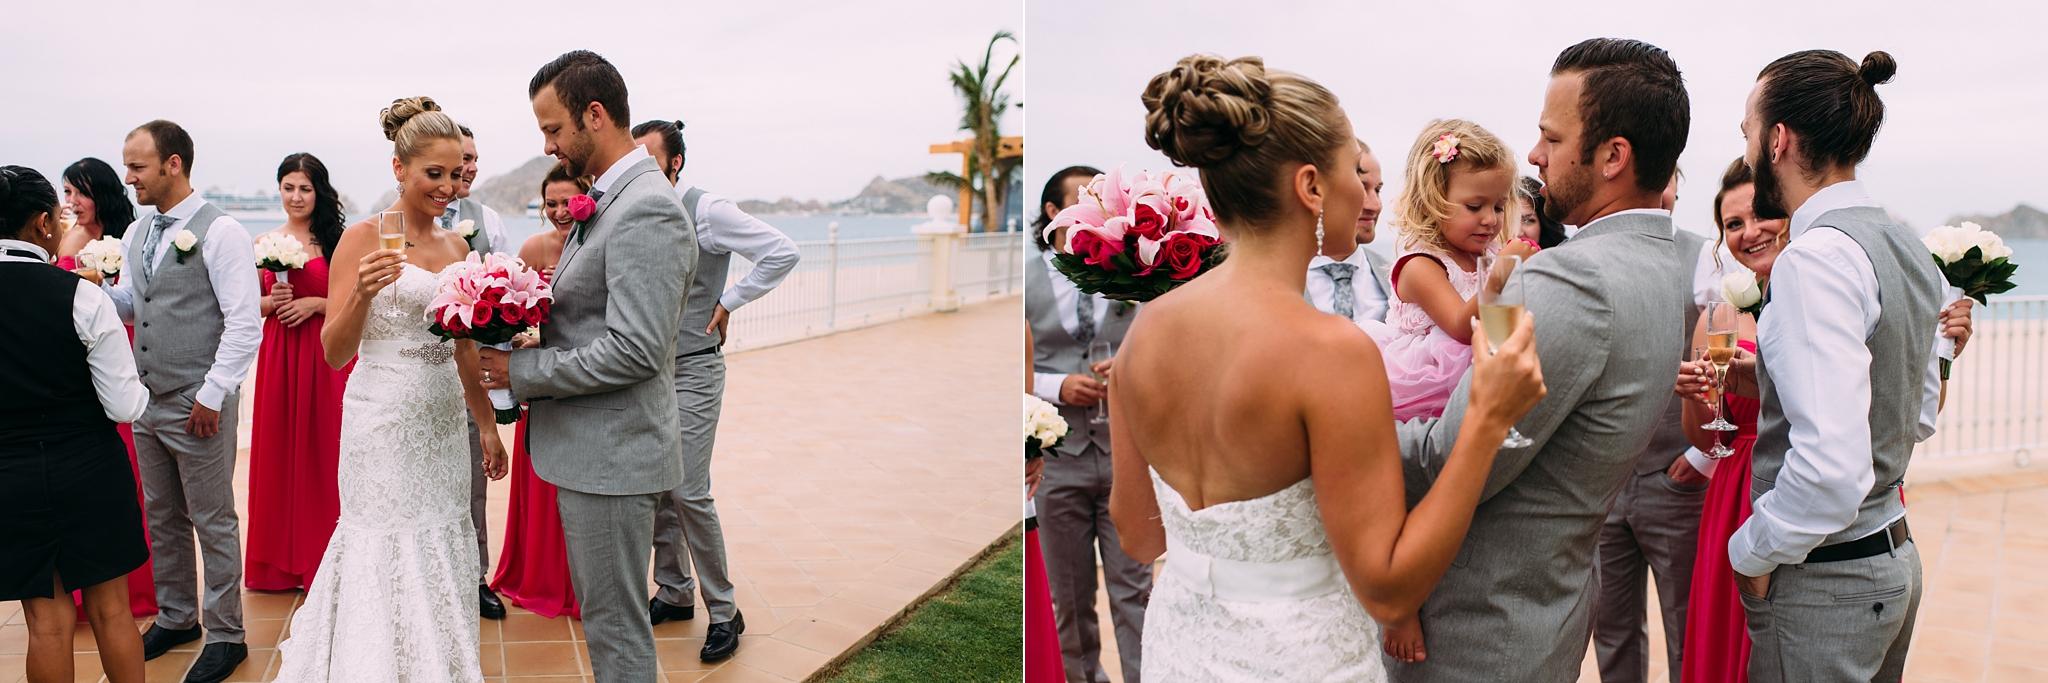 kaihla_tonai_intimate_wedding_elopement_photographer_1351